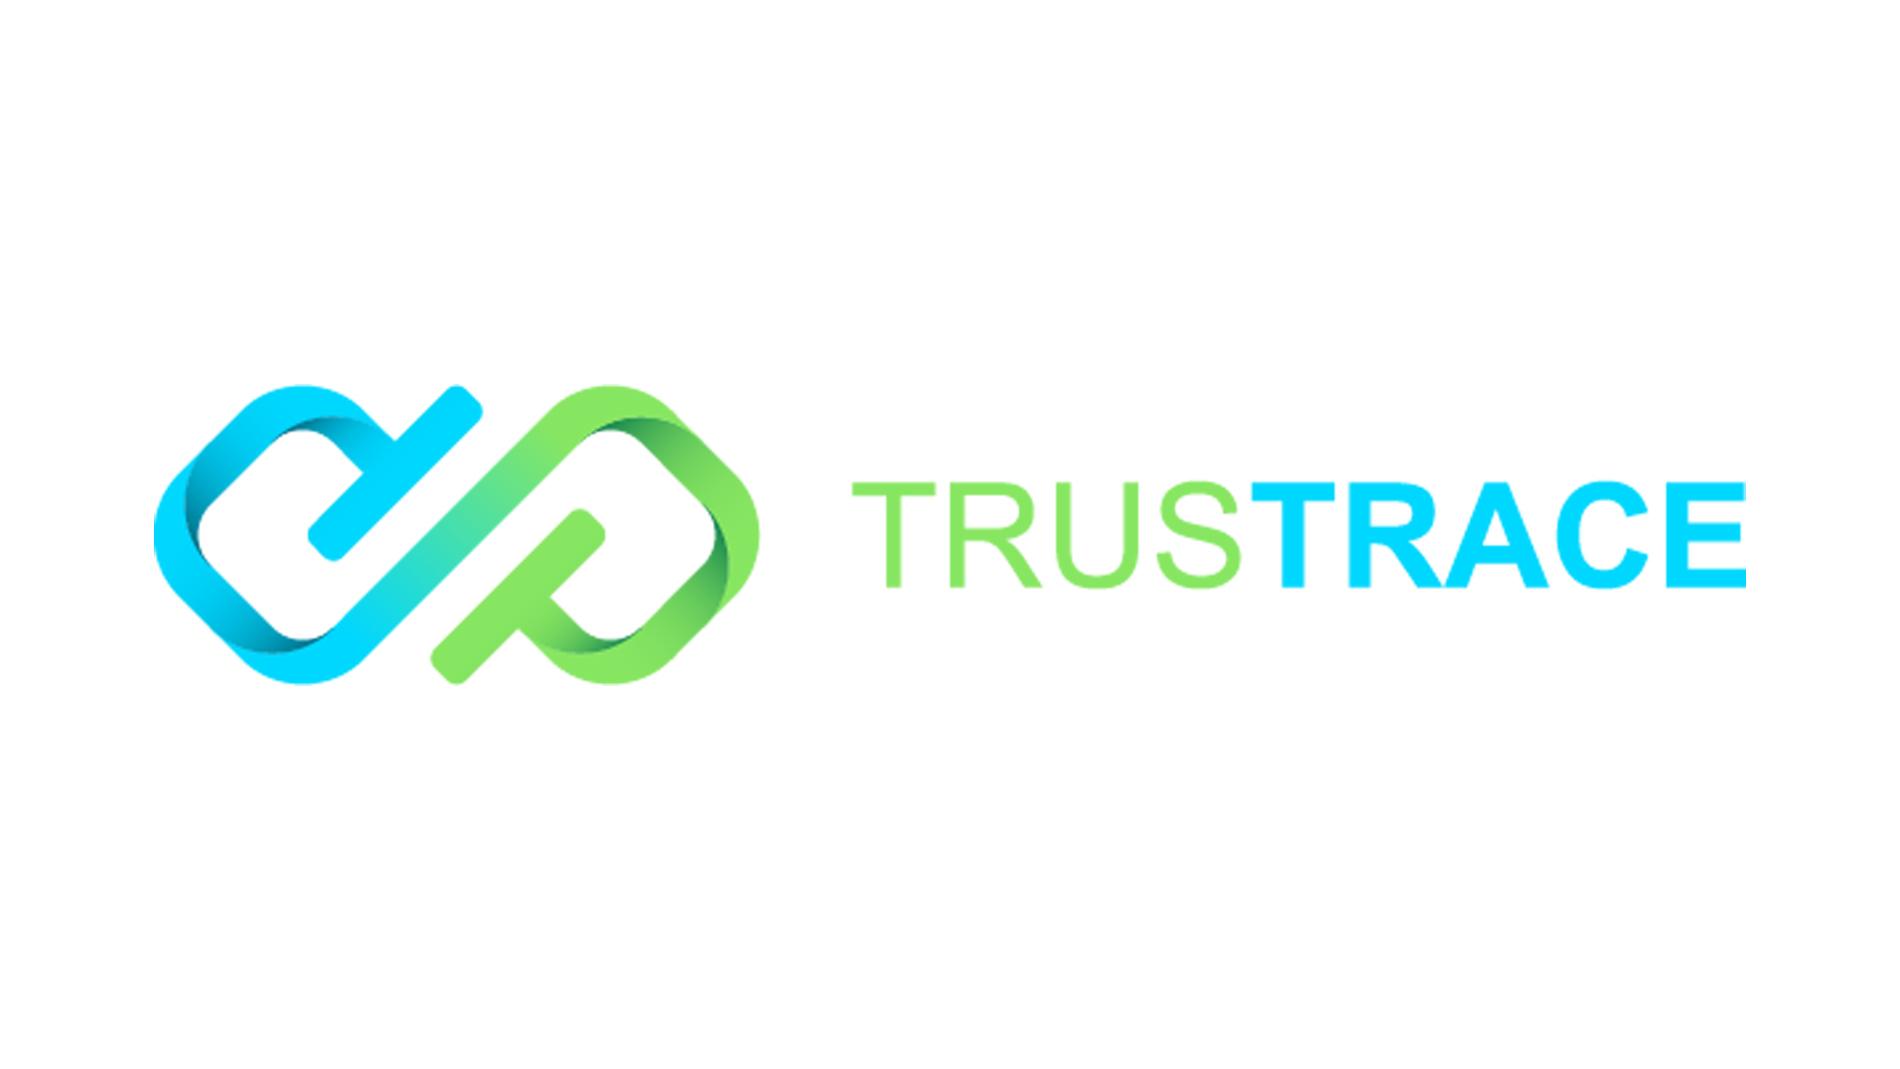 trustrace logo